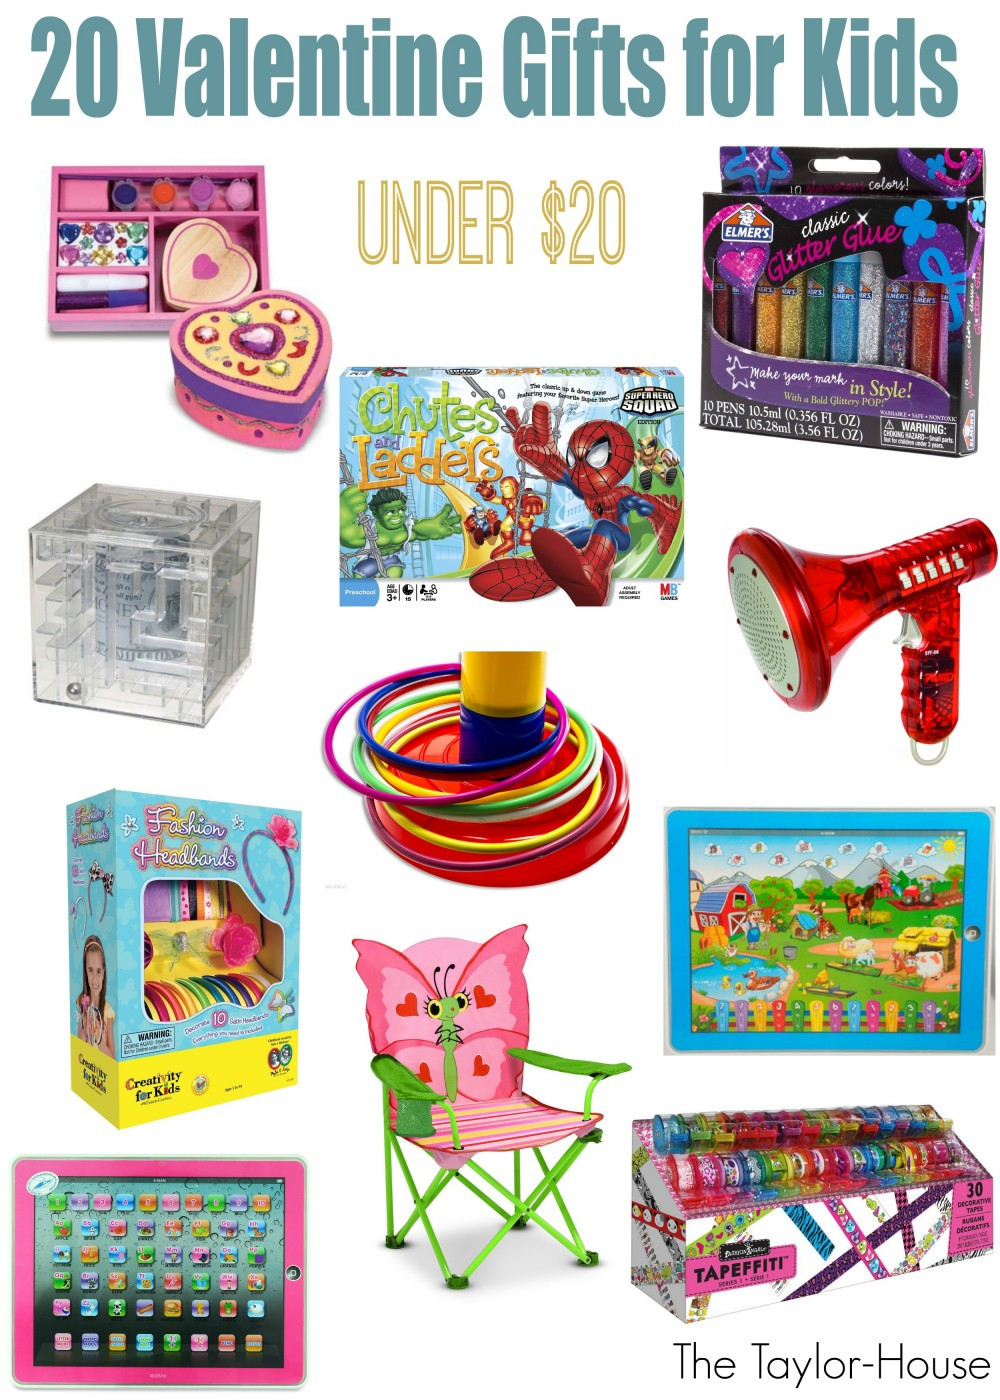 Gift Ideas For Children  Valentine Gift Ideas for Kids